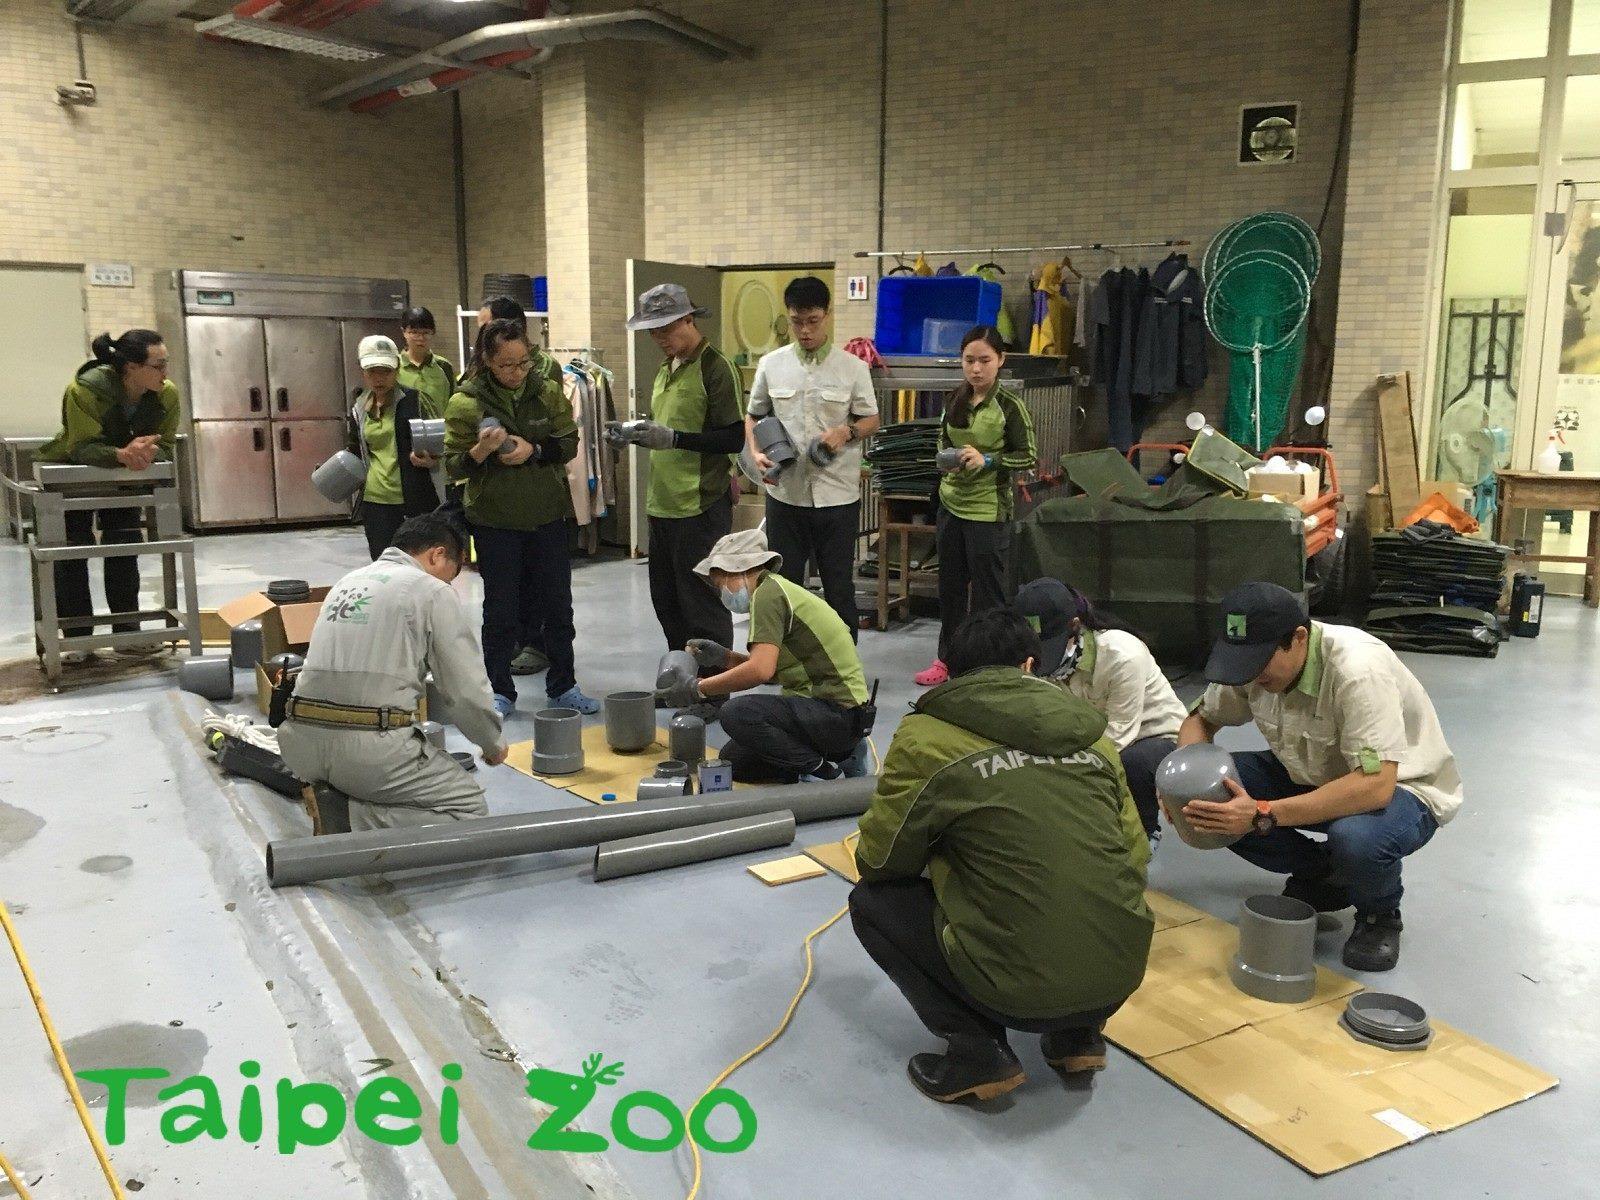 Zoo staff works on DIY animal toys